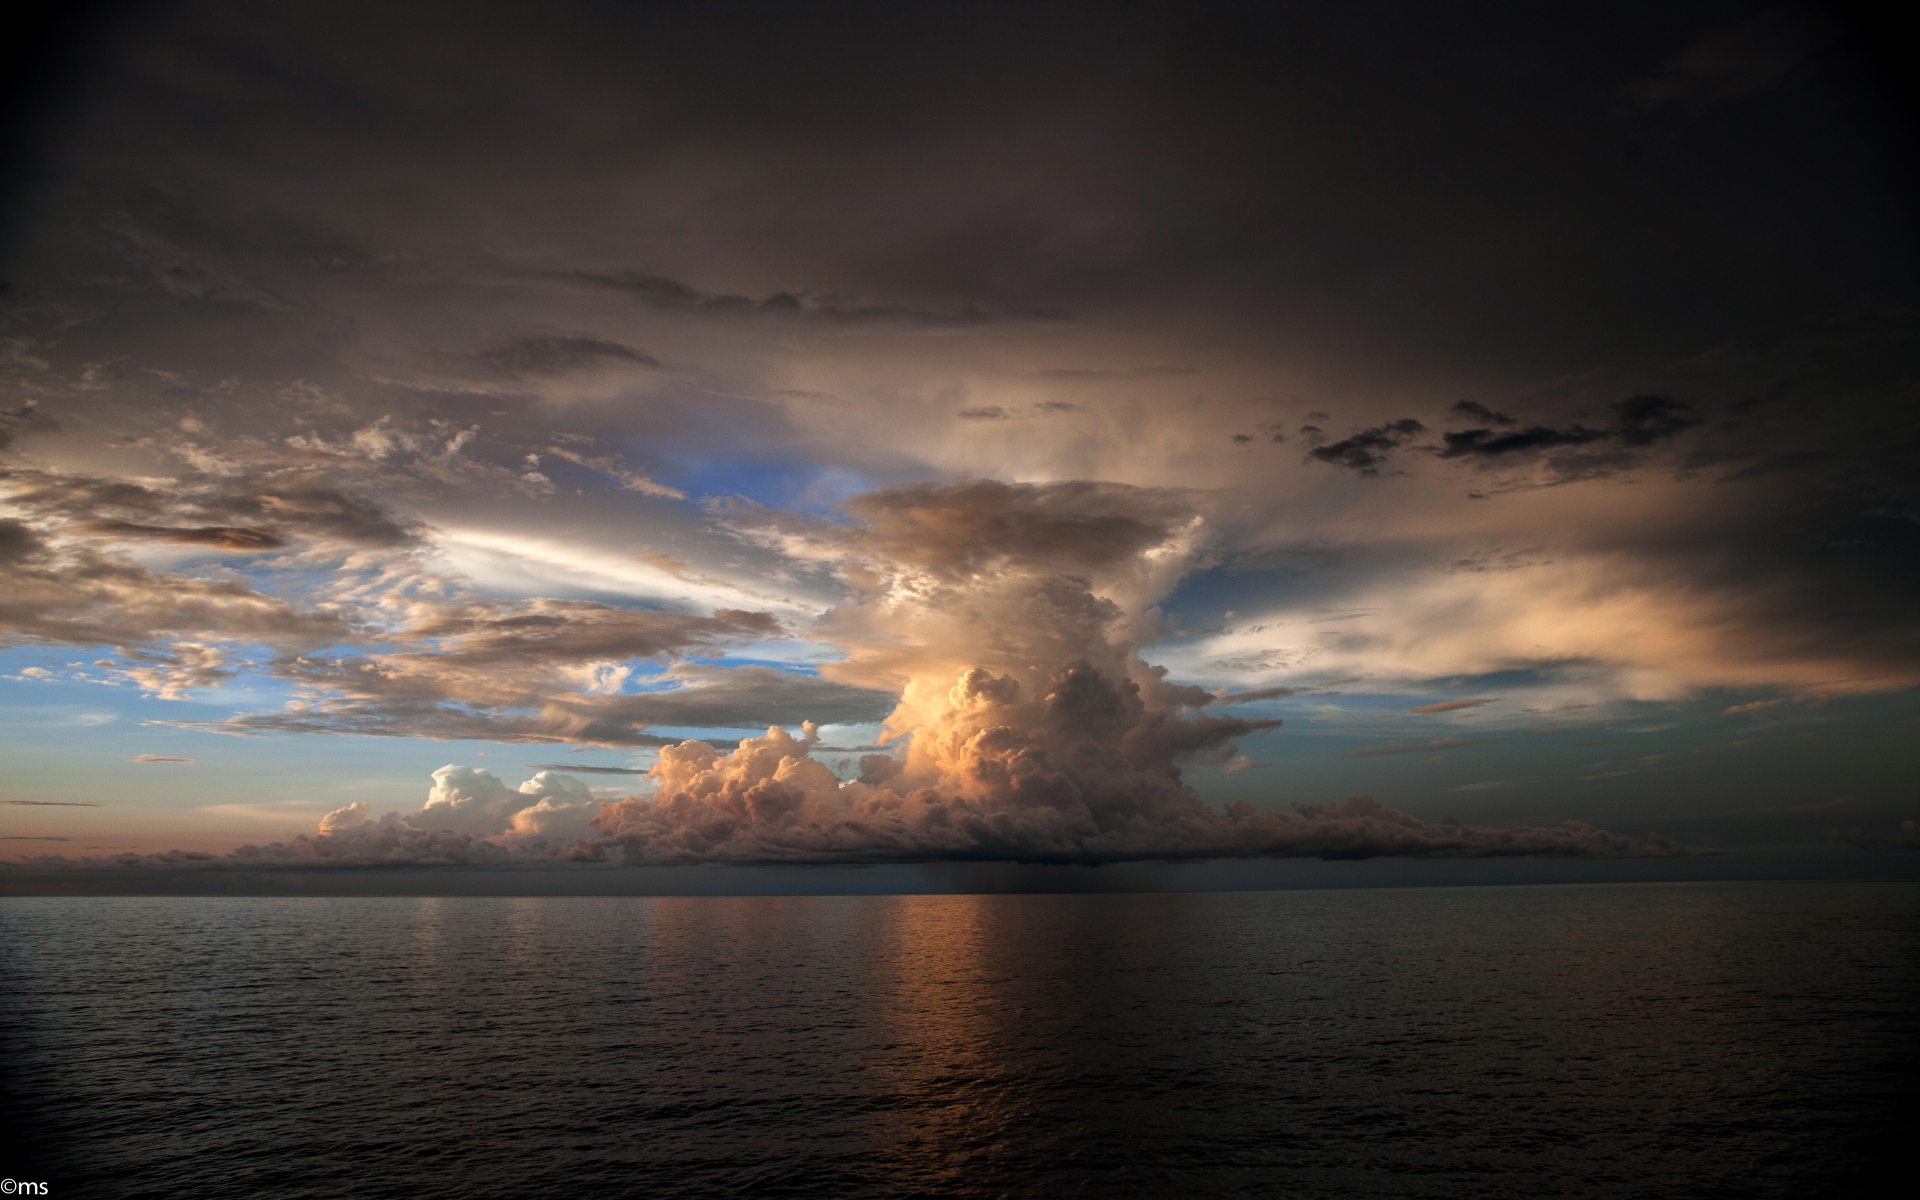 cloud background wallpaper